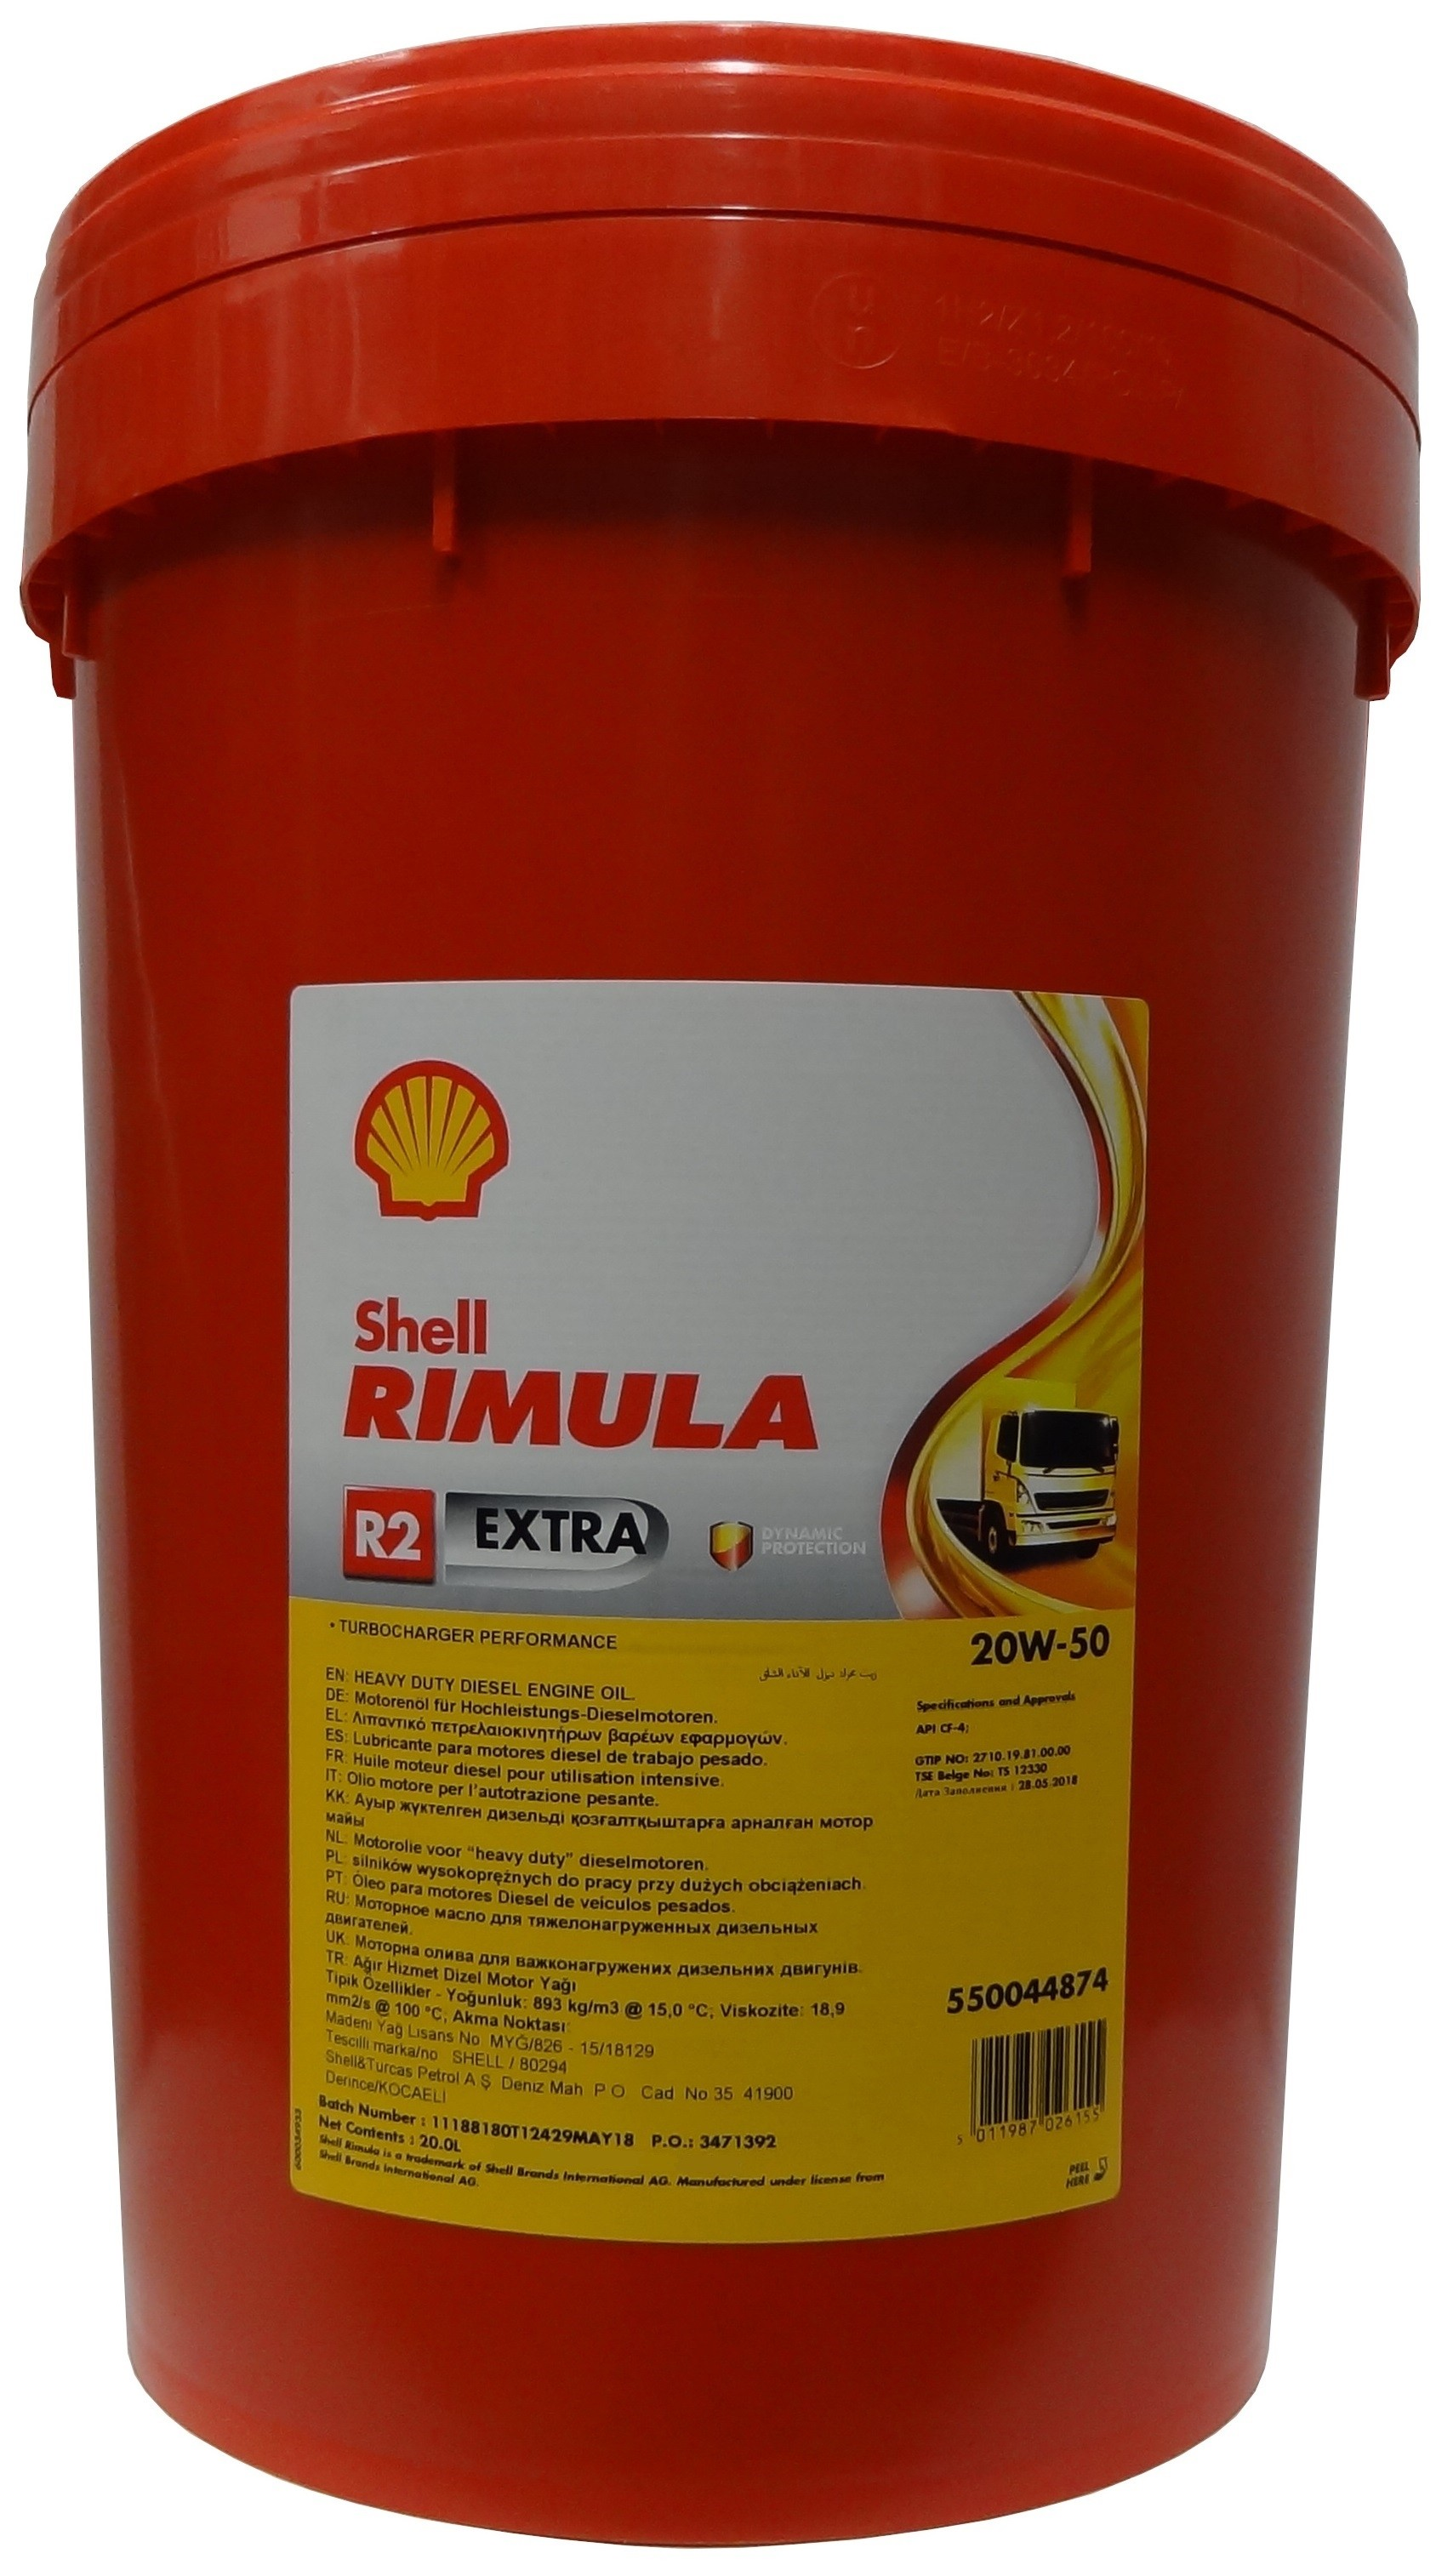 SHELL RIMULA R2 Extra 20W-50 20L